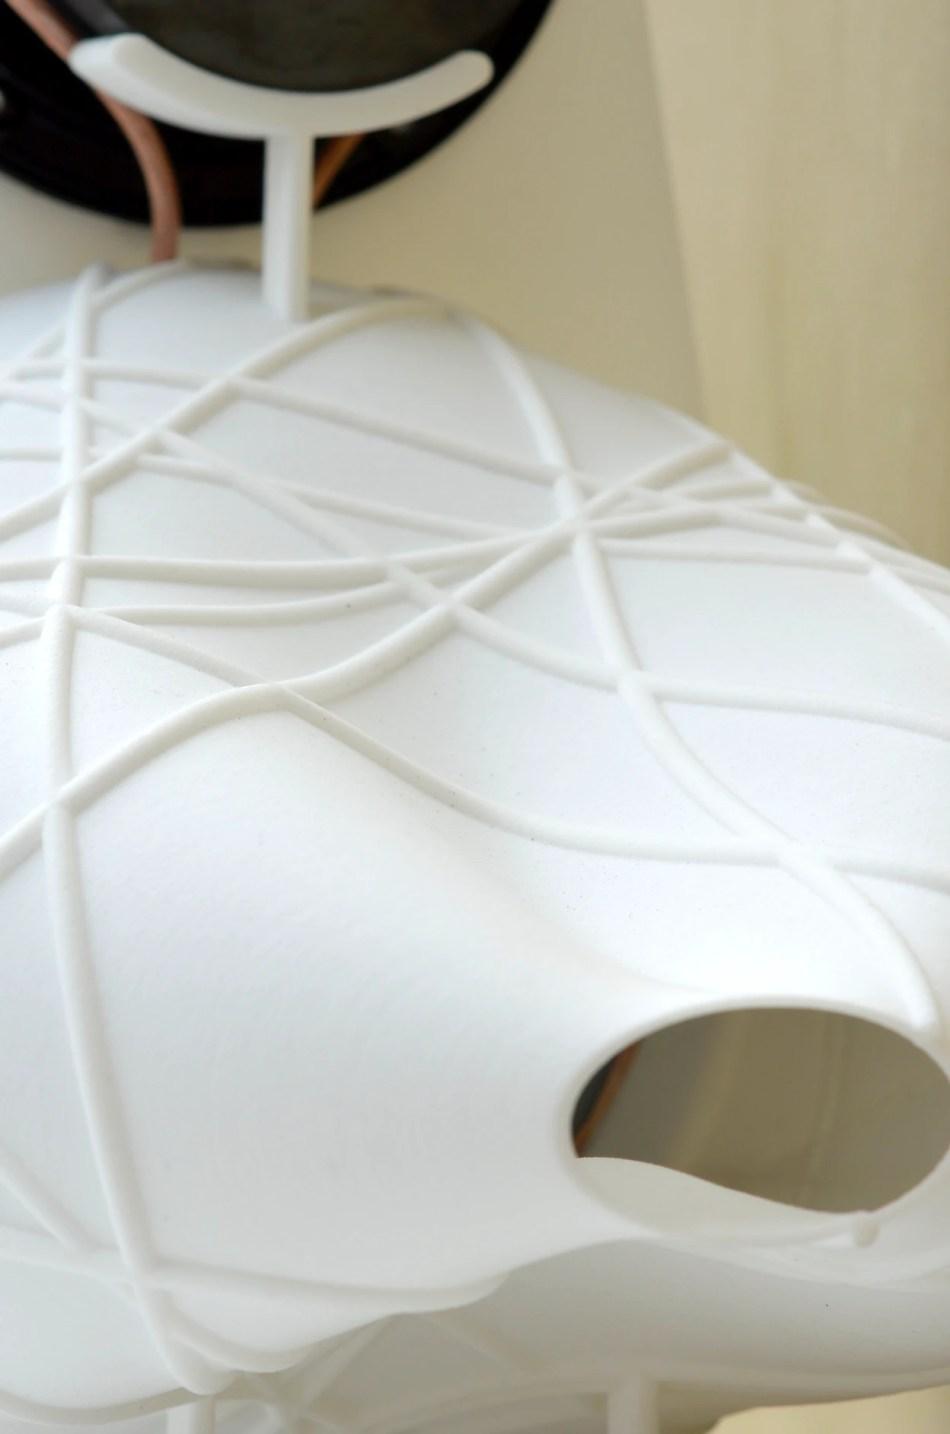 Serendipity speakers - ported woofer design